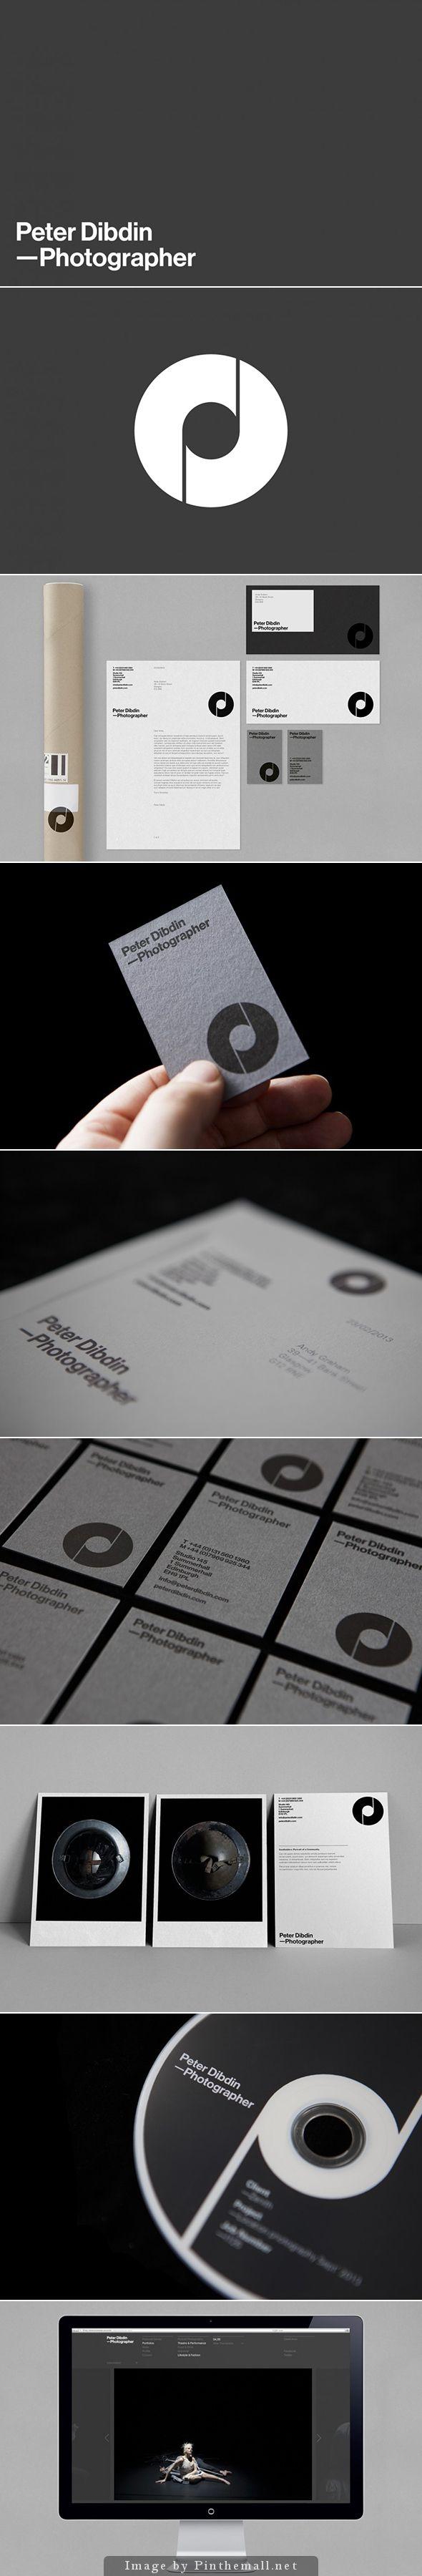 Peter Dibdin personal branding. Design by ostreet - created via http://pinthemall.net